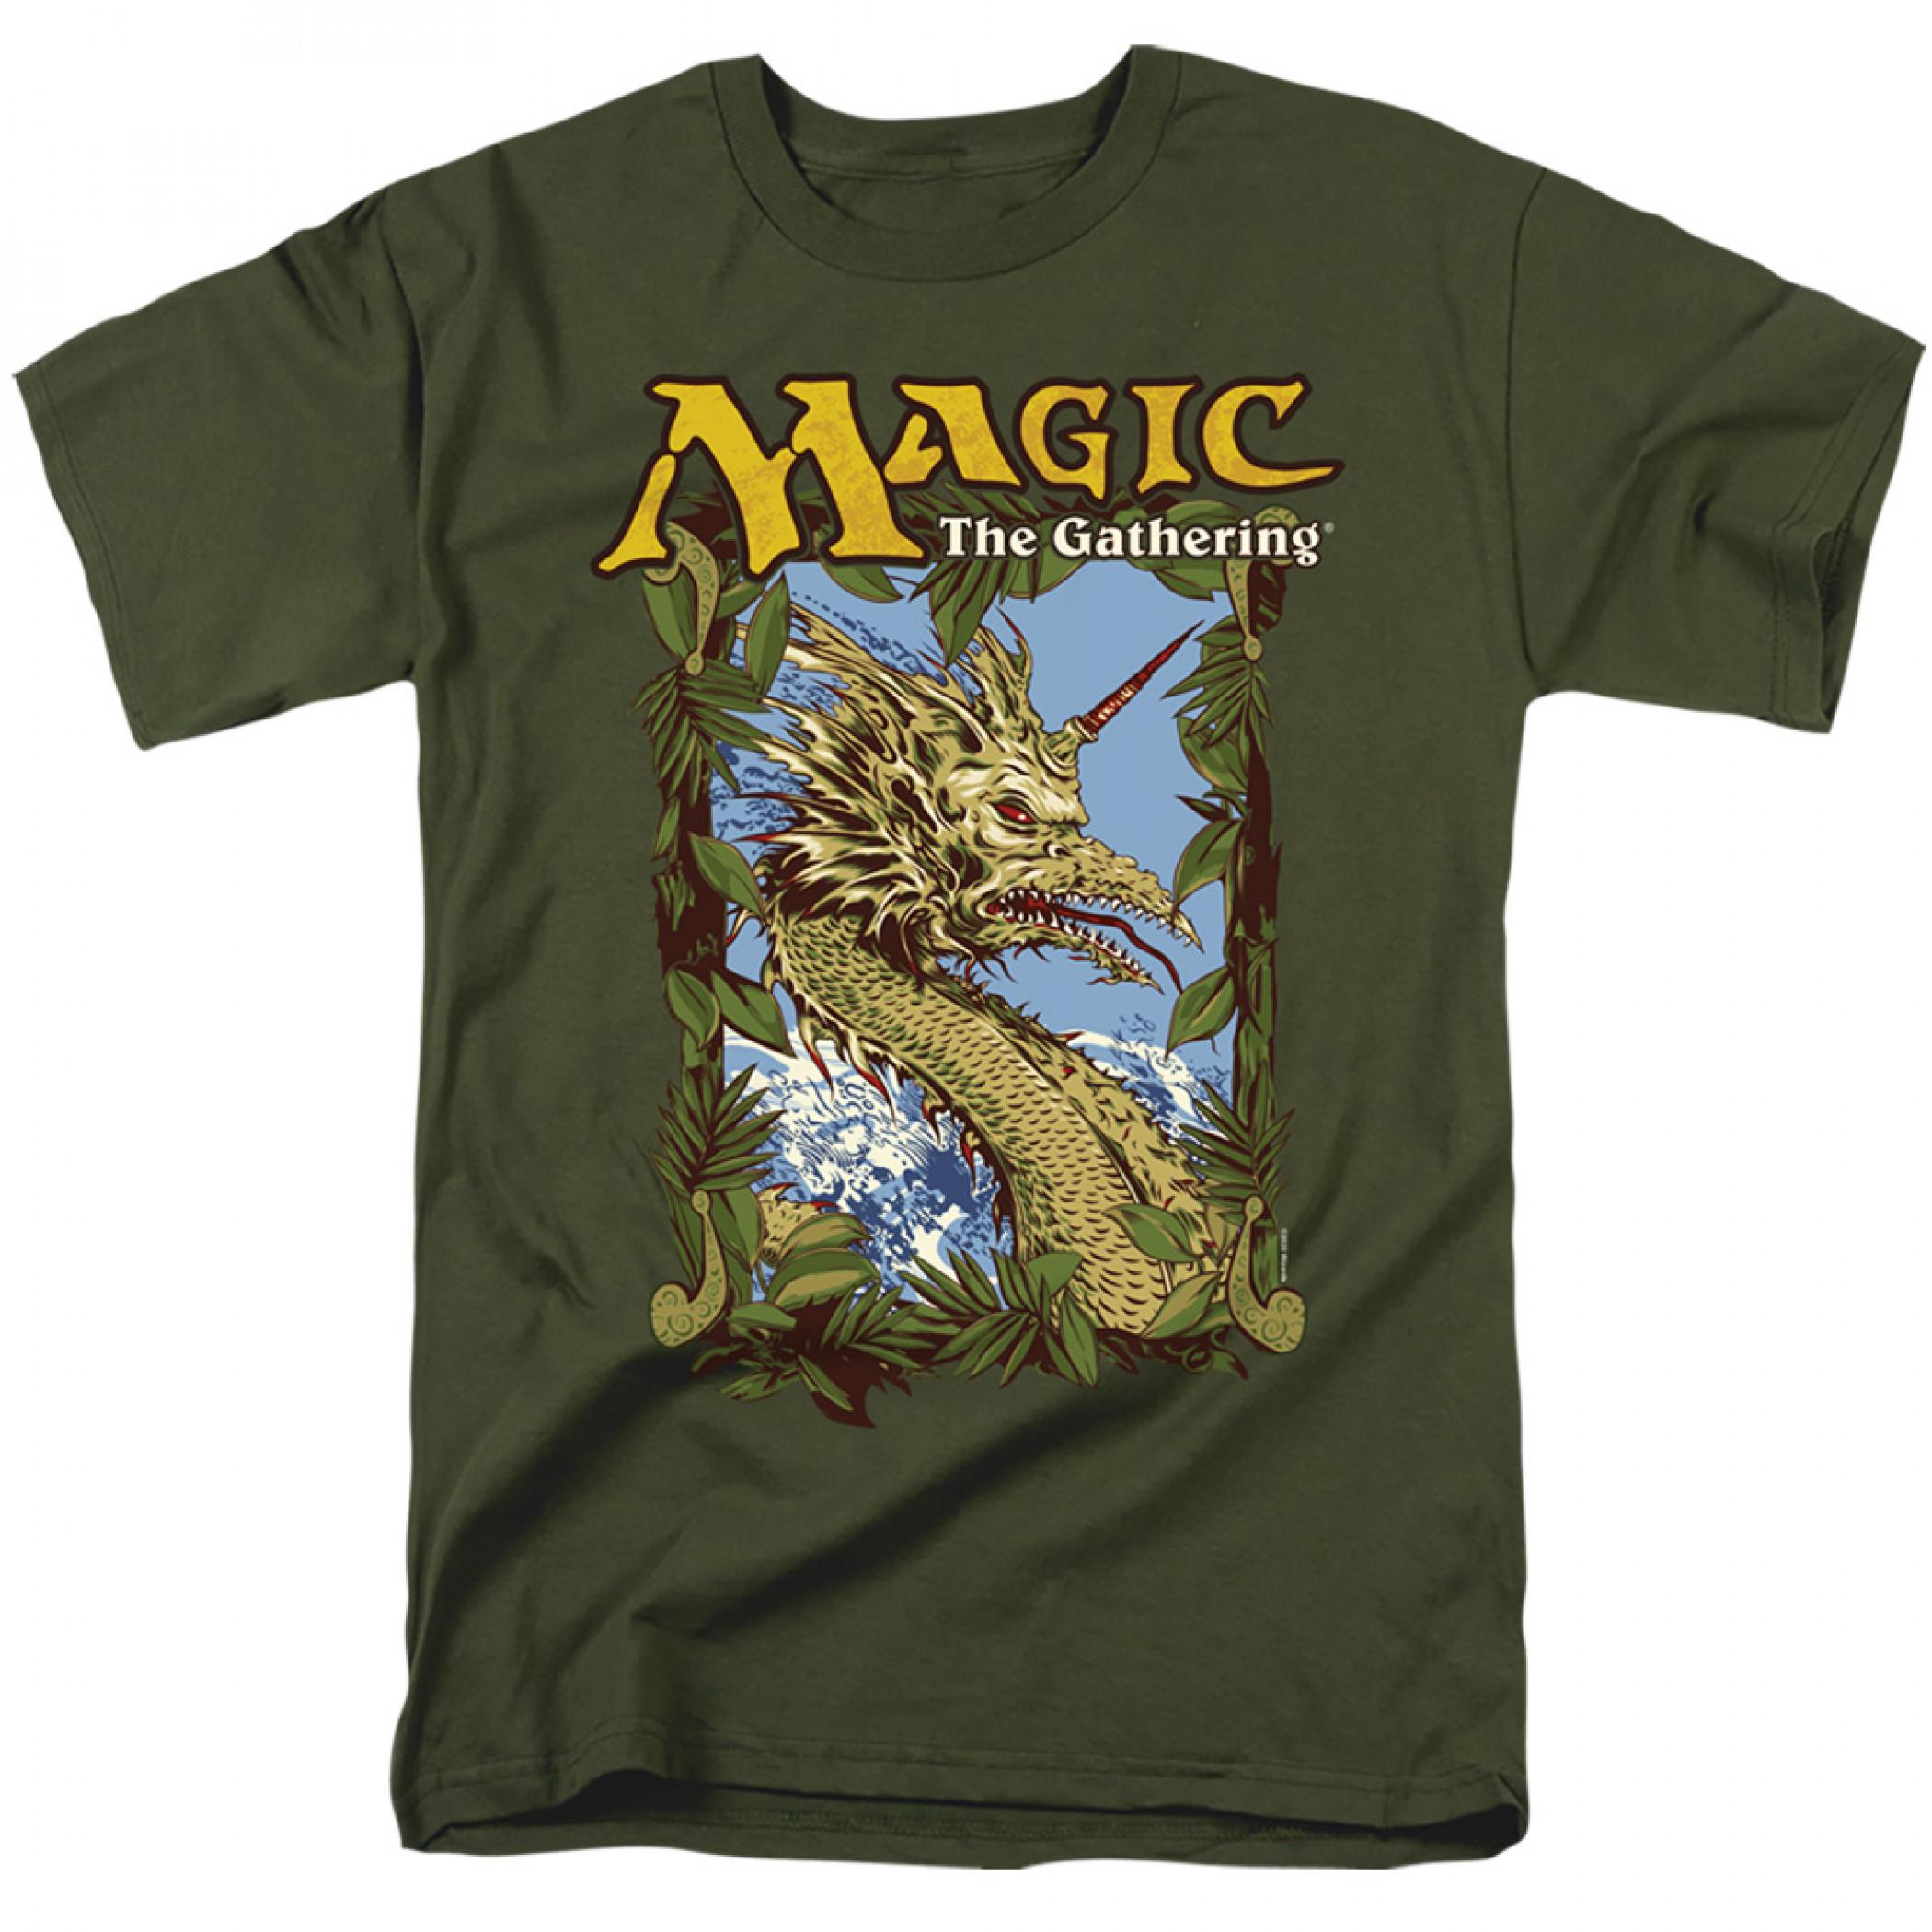 Magic the Gathering Mirage T-Shirt